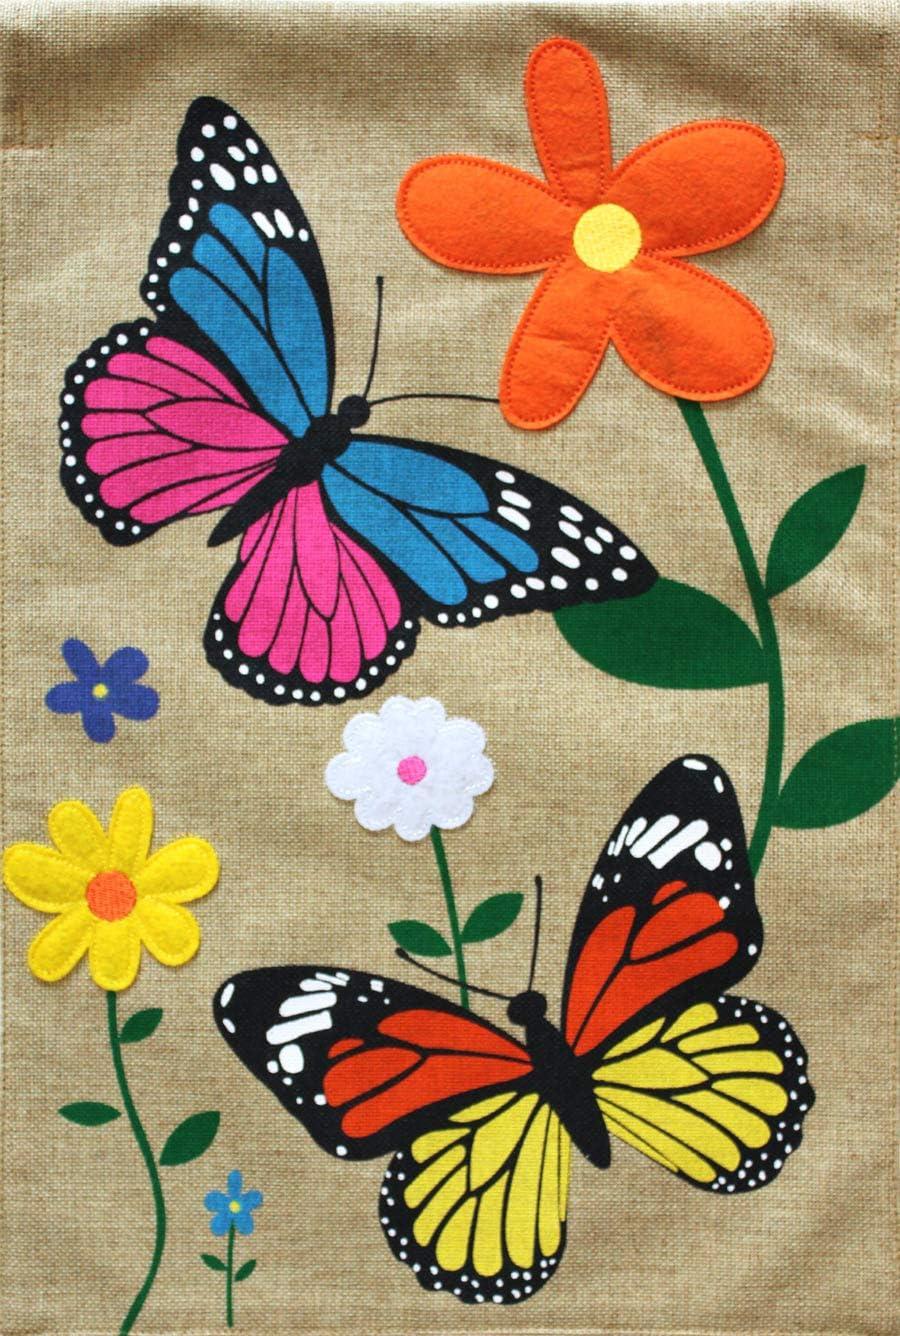 "Briarwood Lane Butterfly Dance Burlap Spring Garden Flag Floral 12.5"" x 18"""